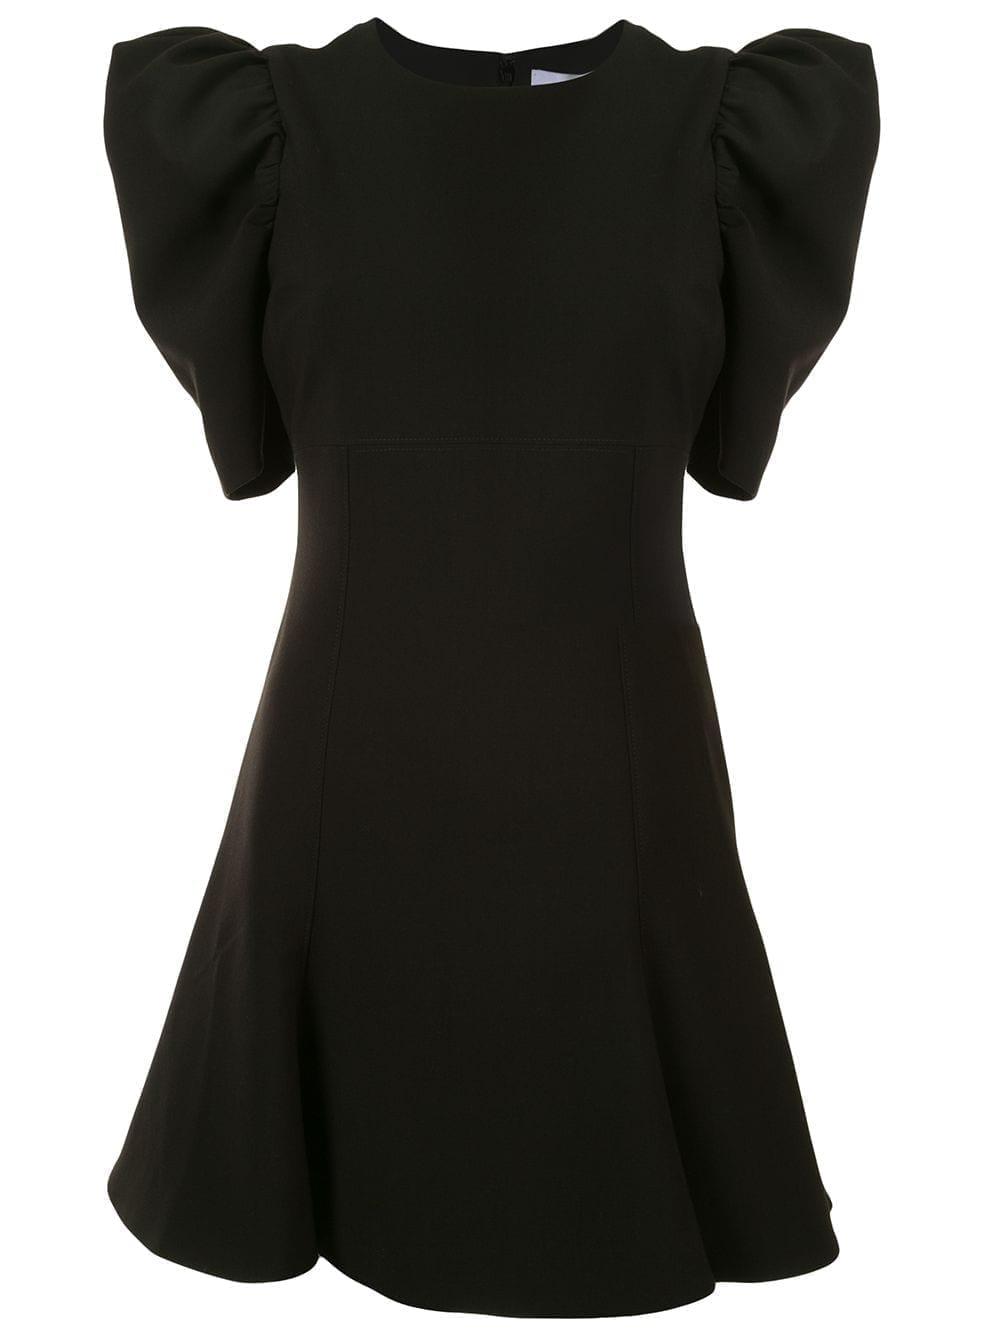 LIKELY Puff Sleeve Mini Dress